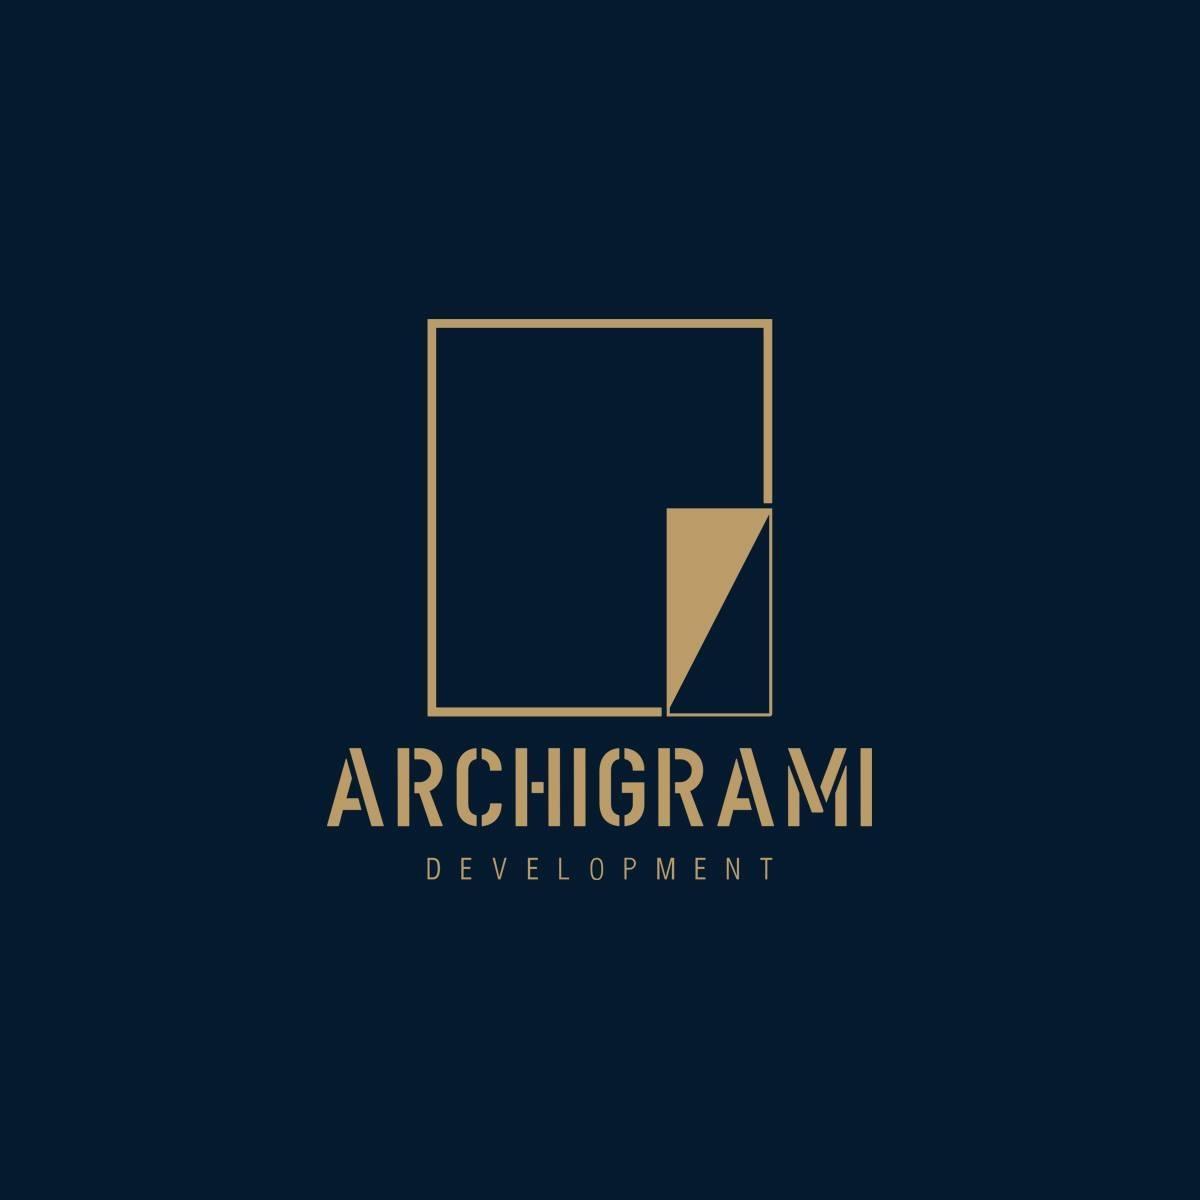 Archigrami